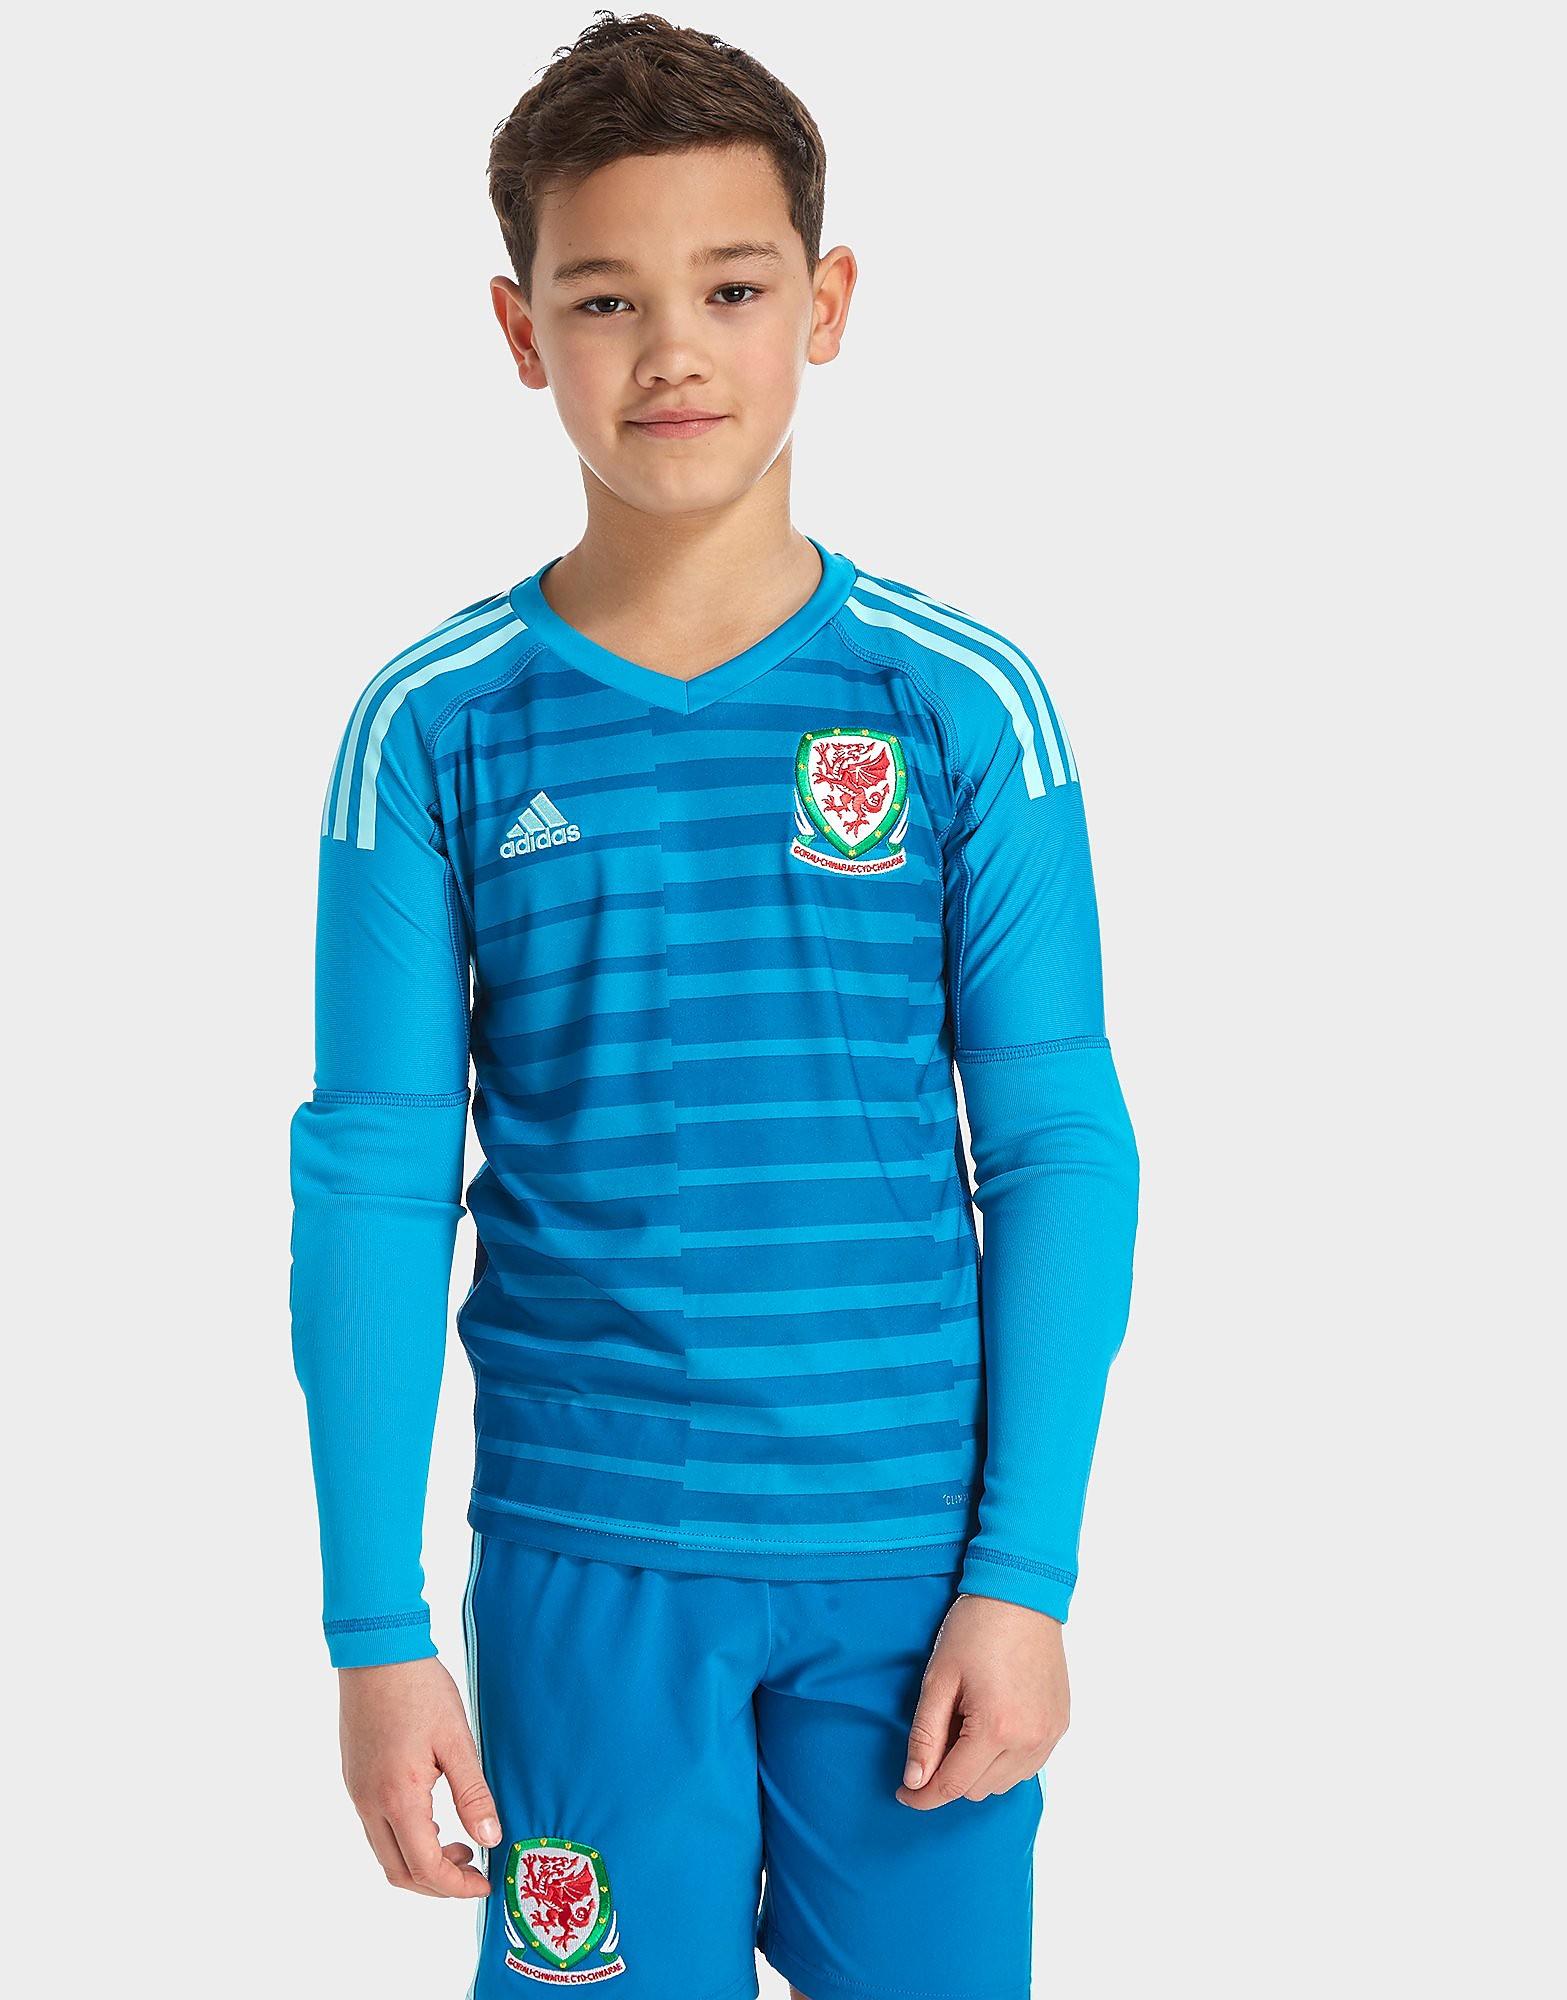 adidas Wales 2018 Home Goalkeeper Shirt Junior